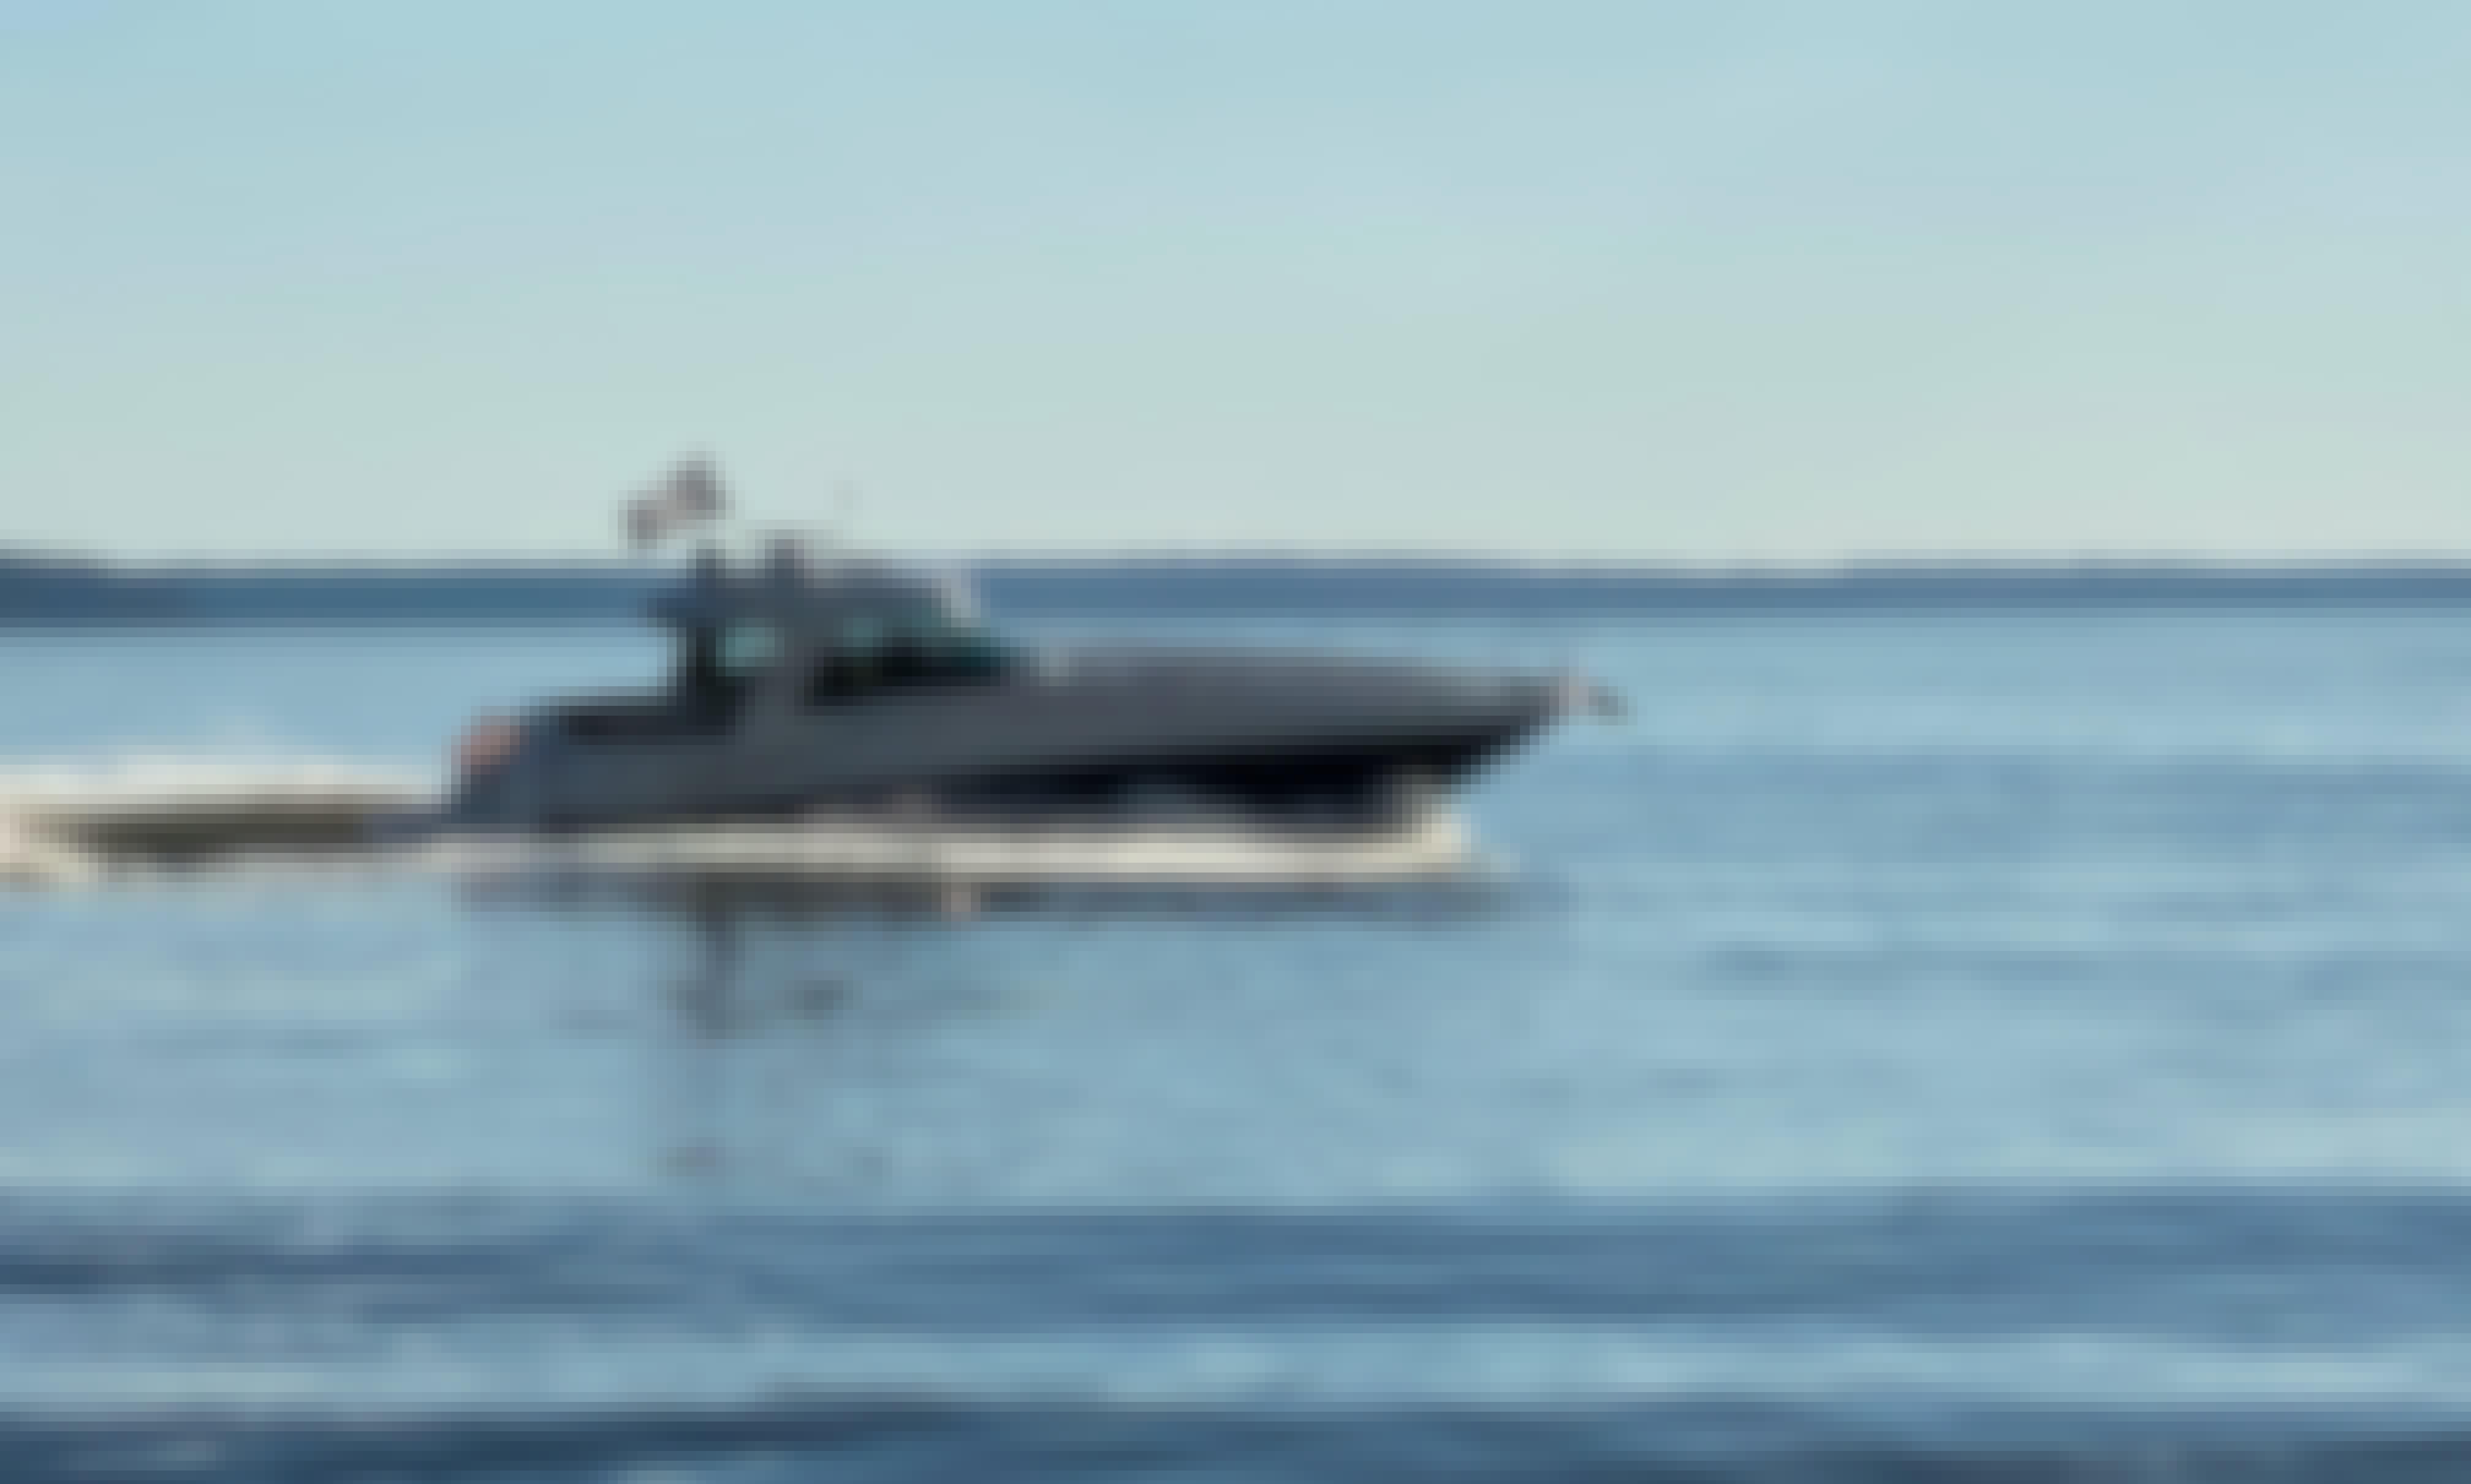 Sea Ray Sundancer 55' Tours on the Potomac River